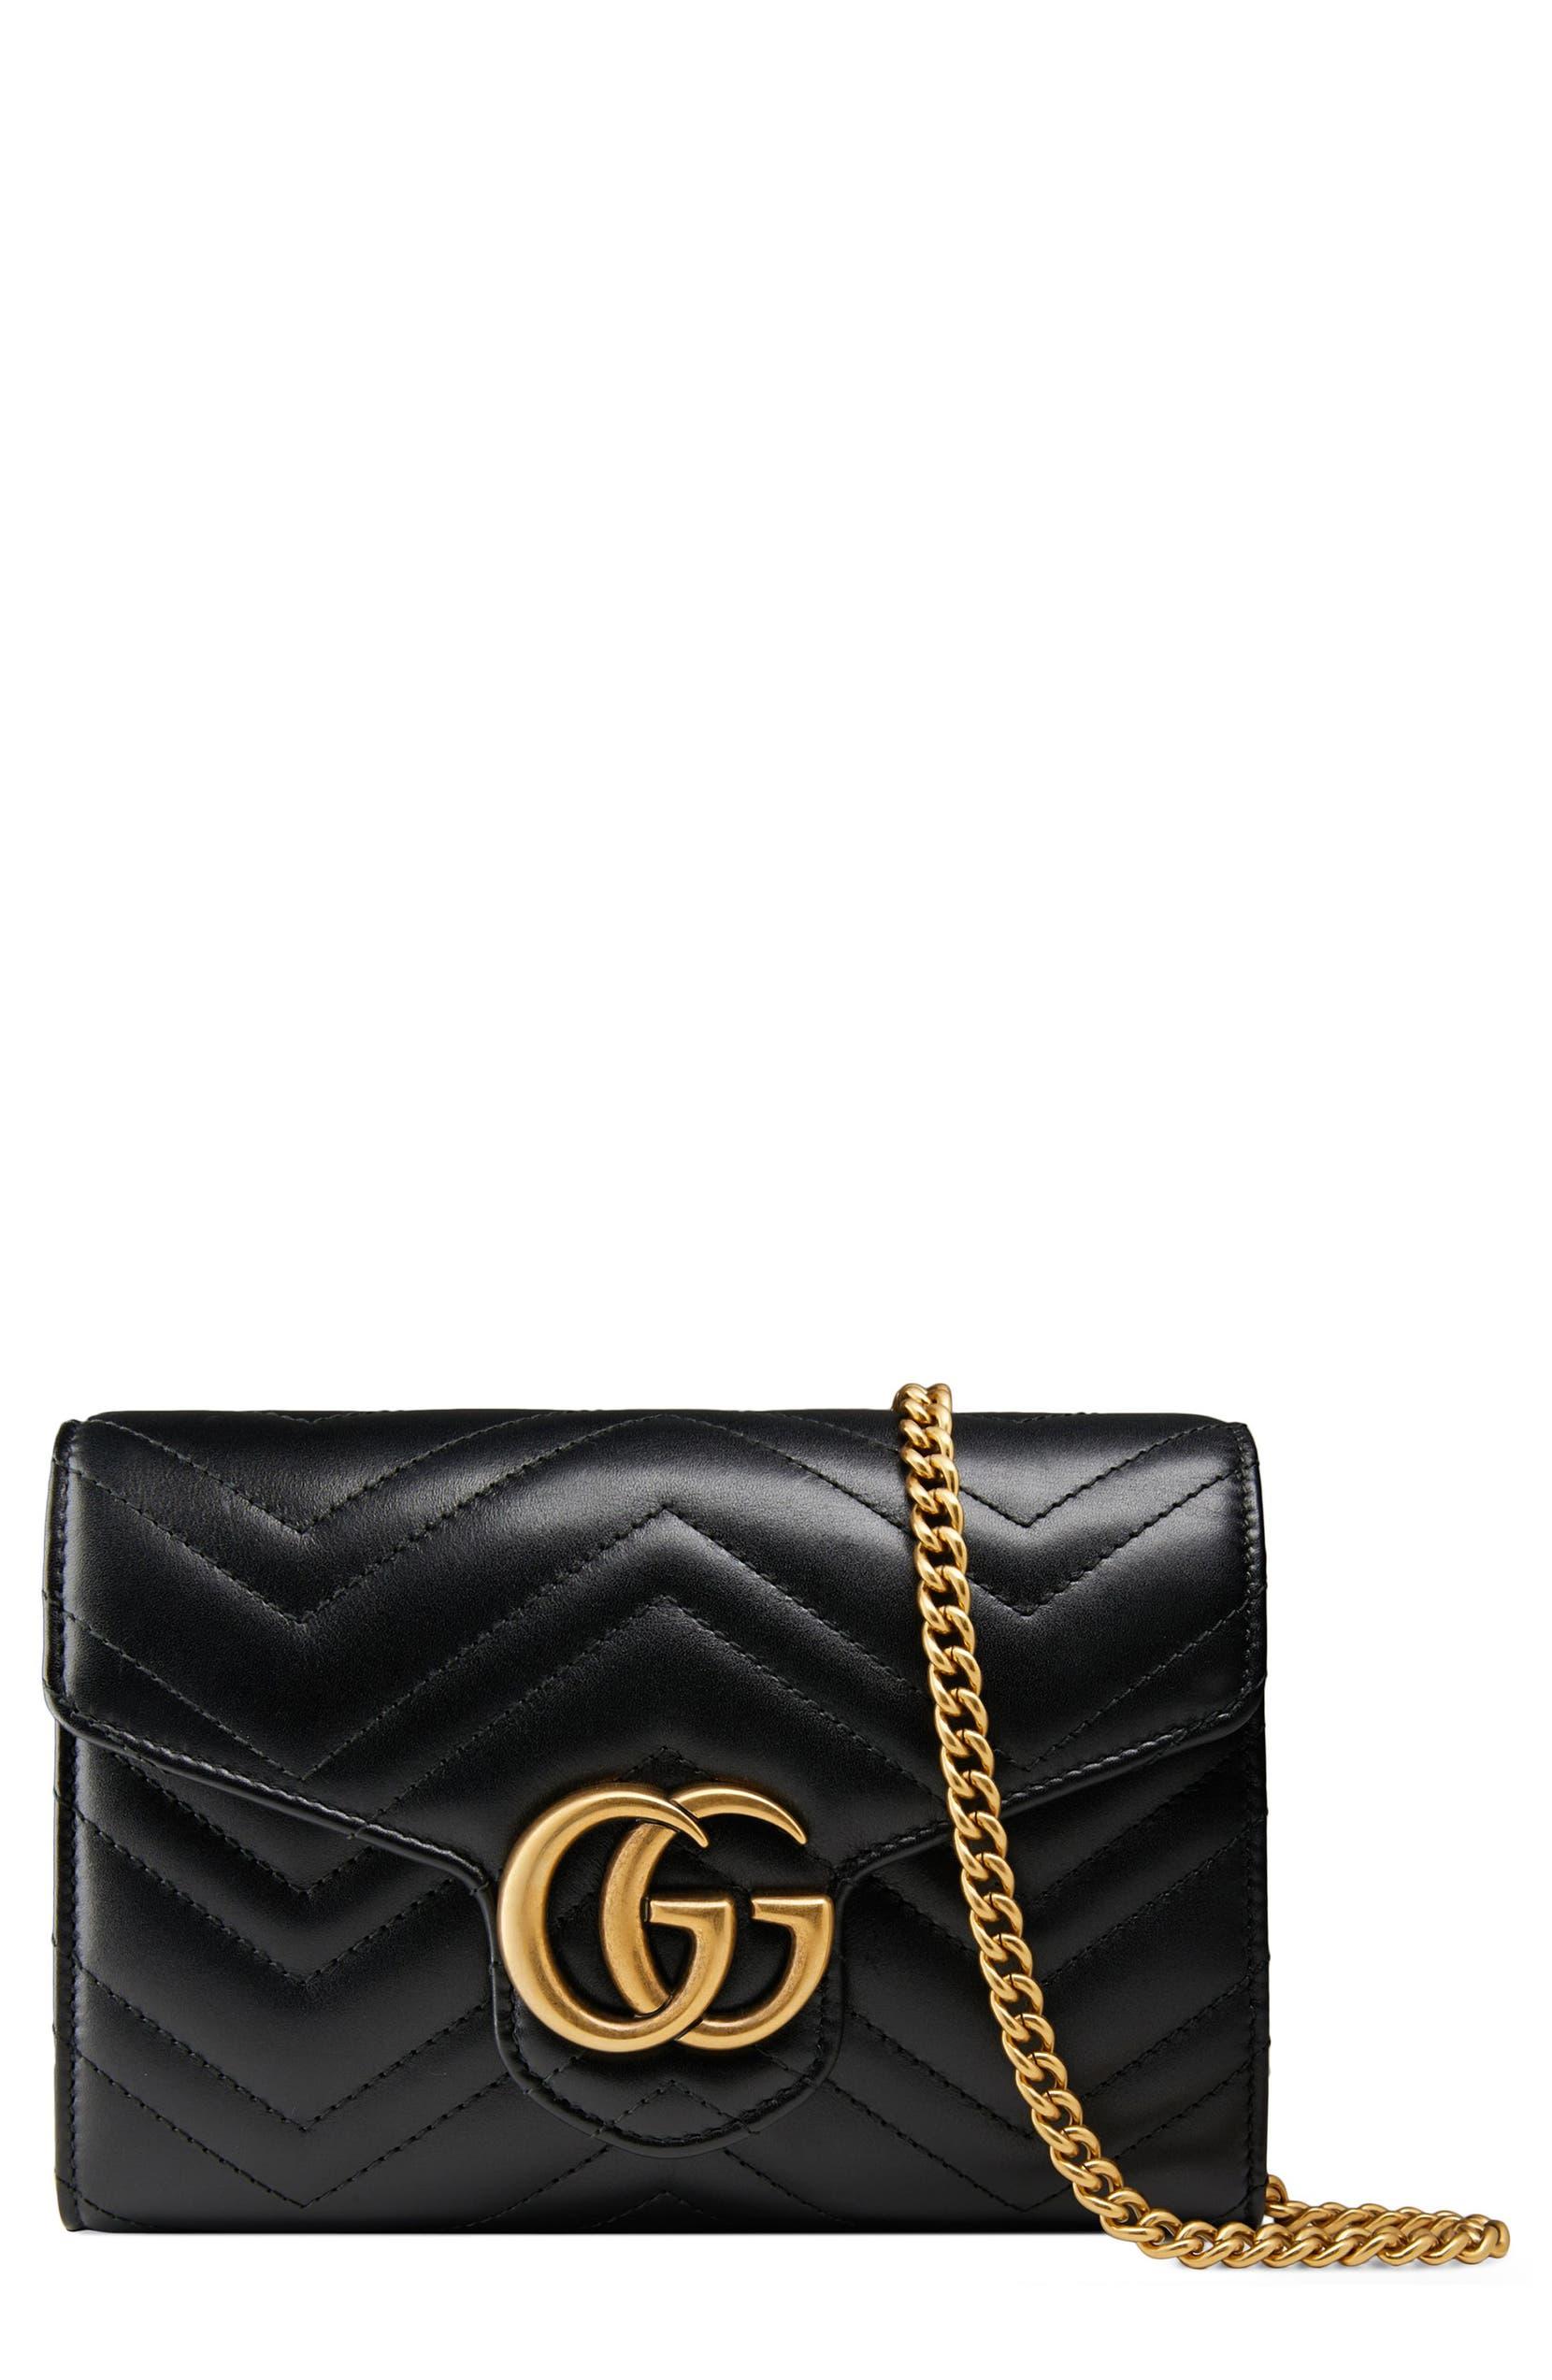 12d7467d0 Gucci GG Marmont Matelassé Leather Wallet on a Chain | Nordstrom